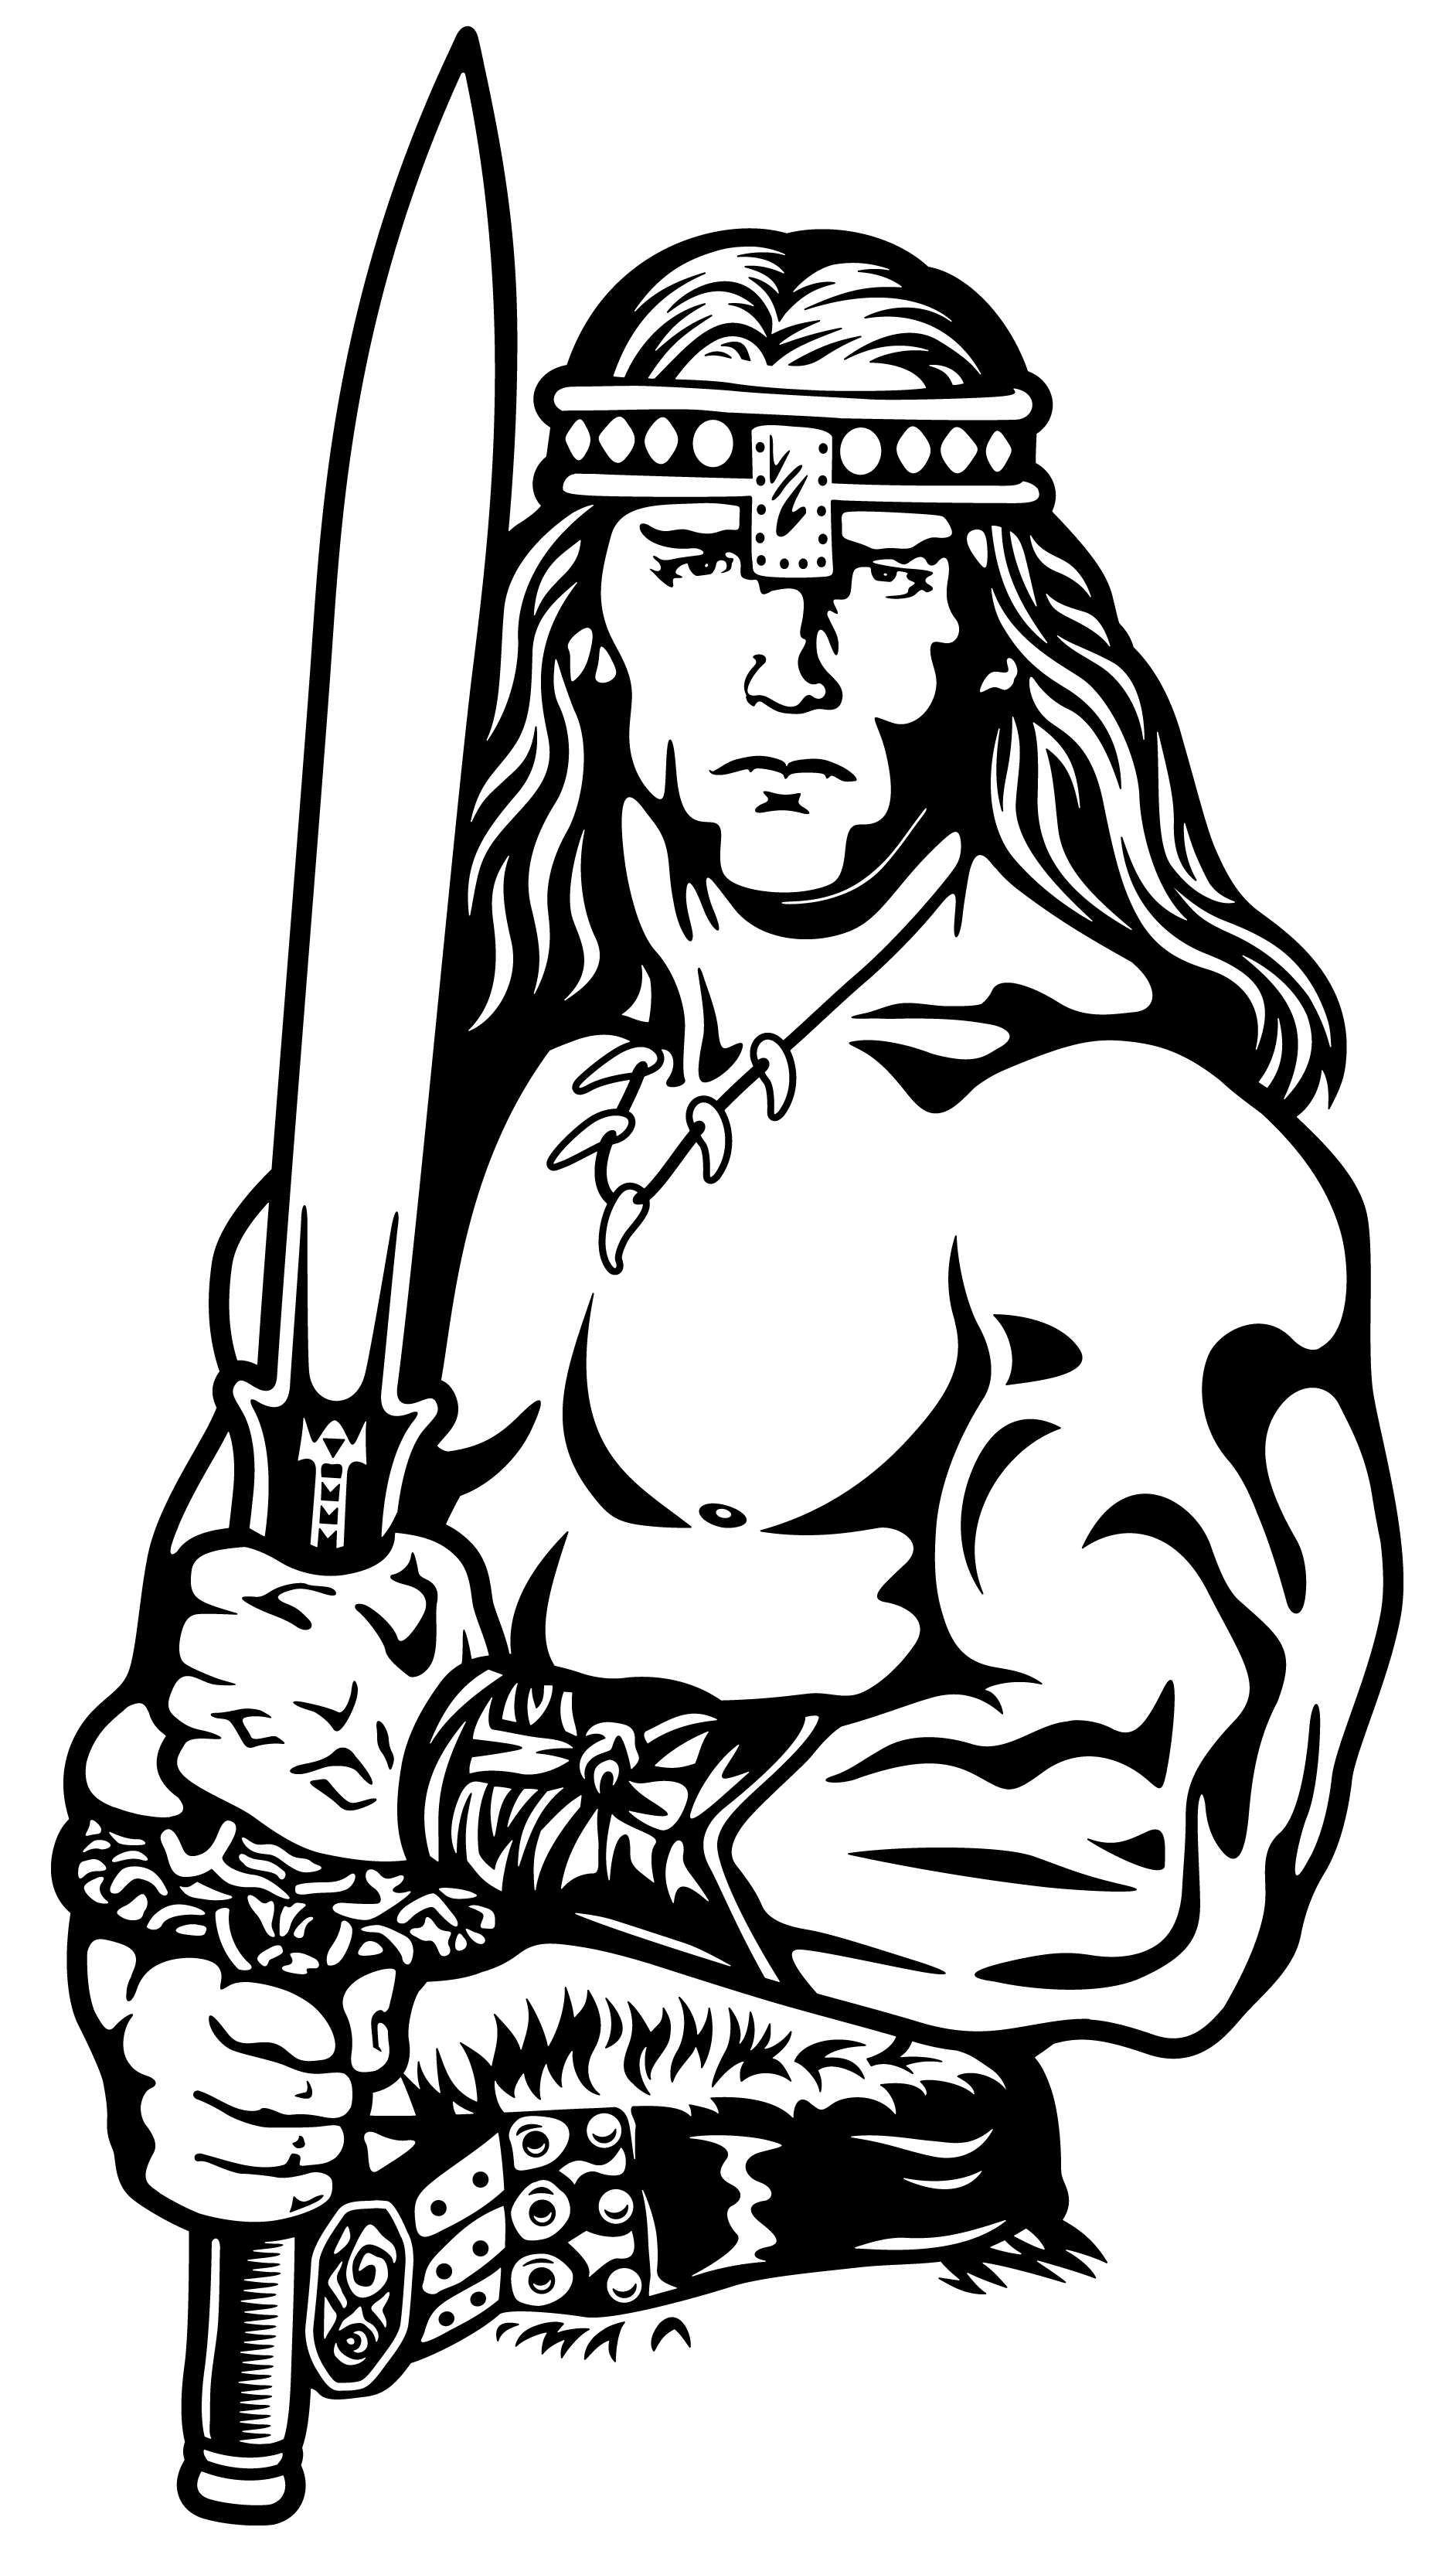 Play Free Web Games Https Playfreeonline32 Com Silhouette Art Stencil Art Drawings